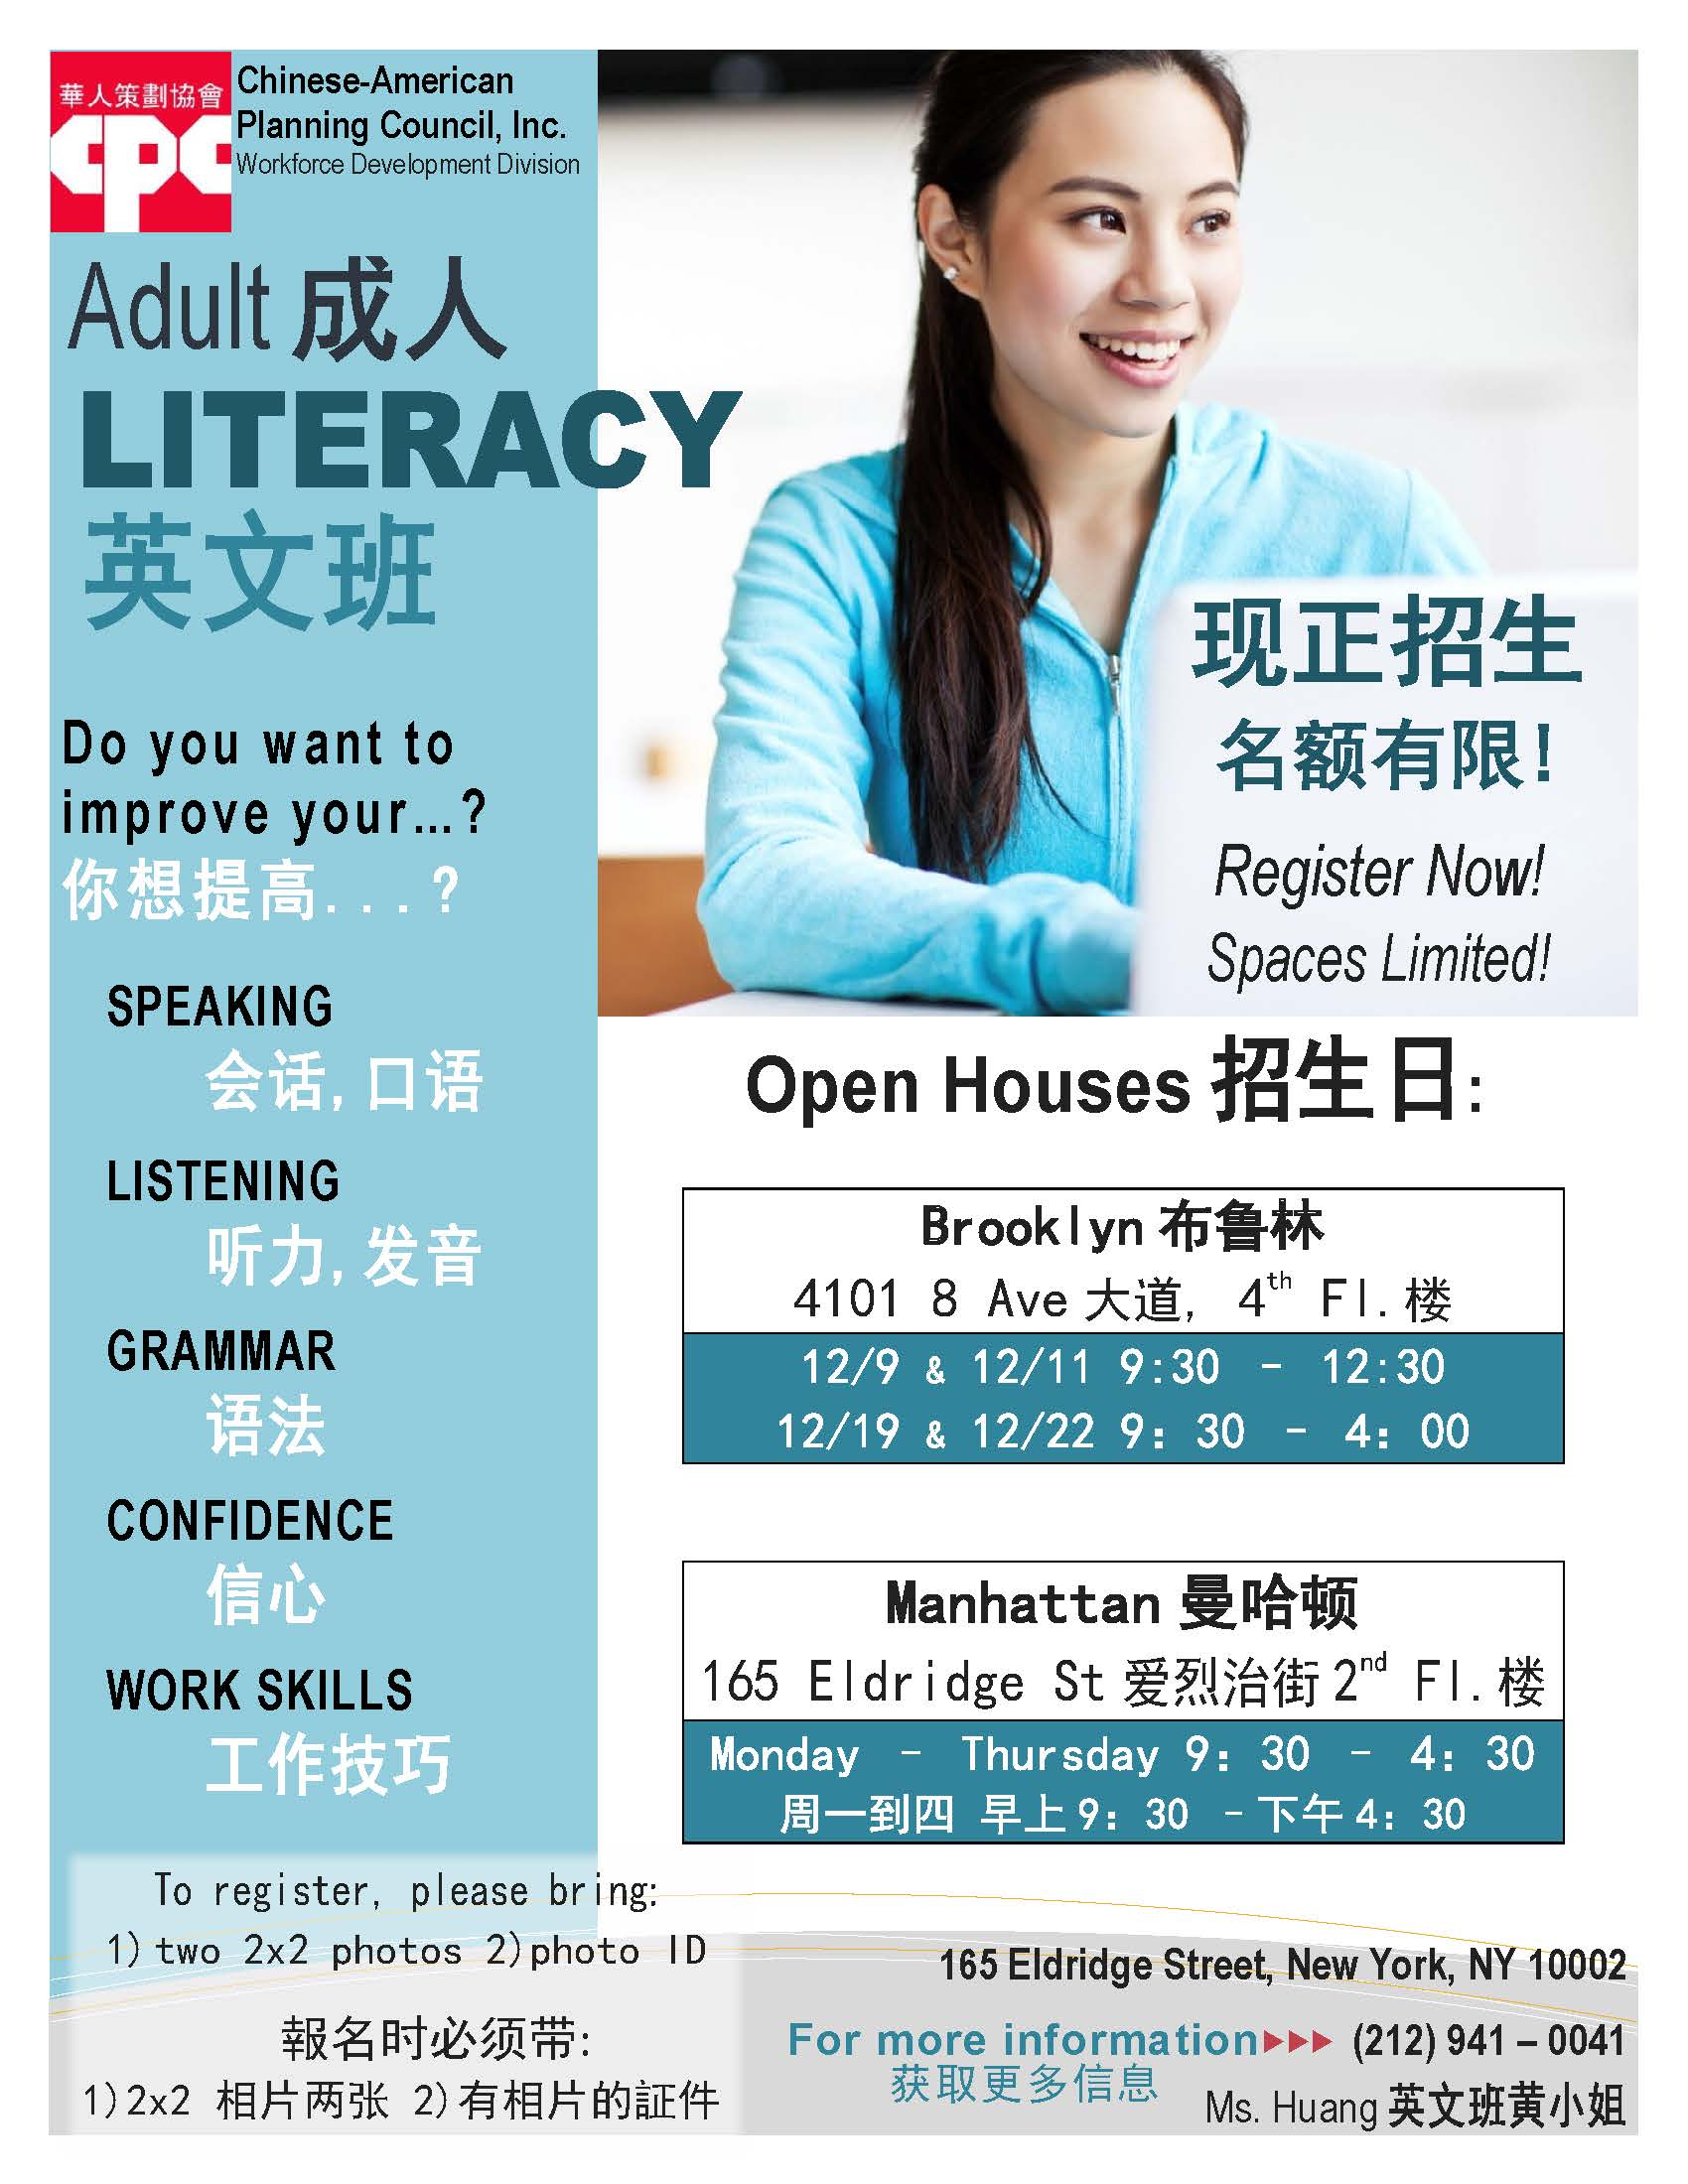 Adult Literacy Program Recruitment 12 09 14 30 00